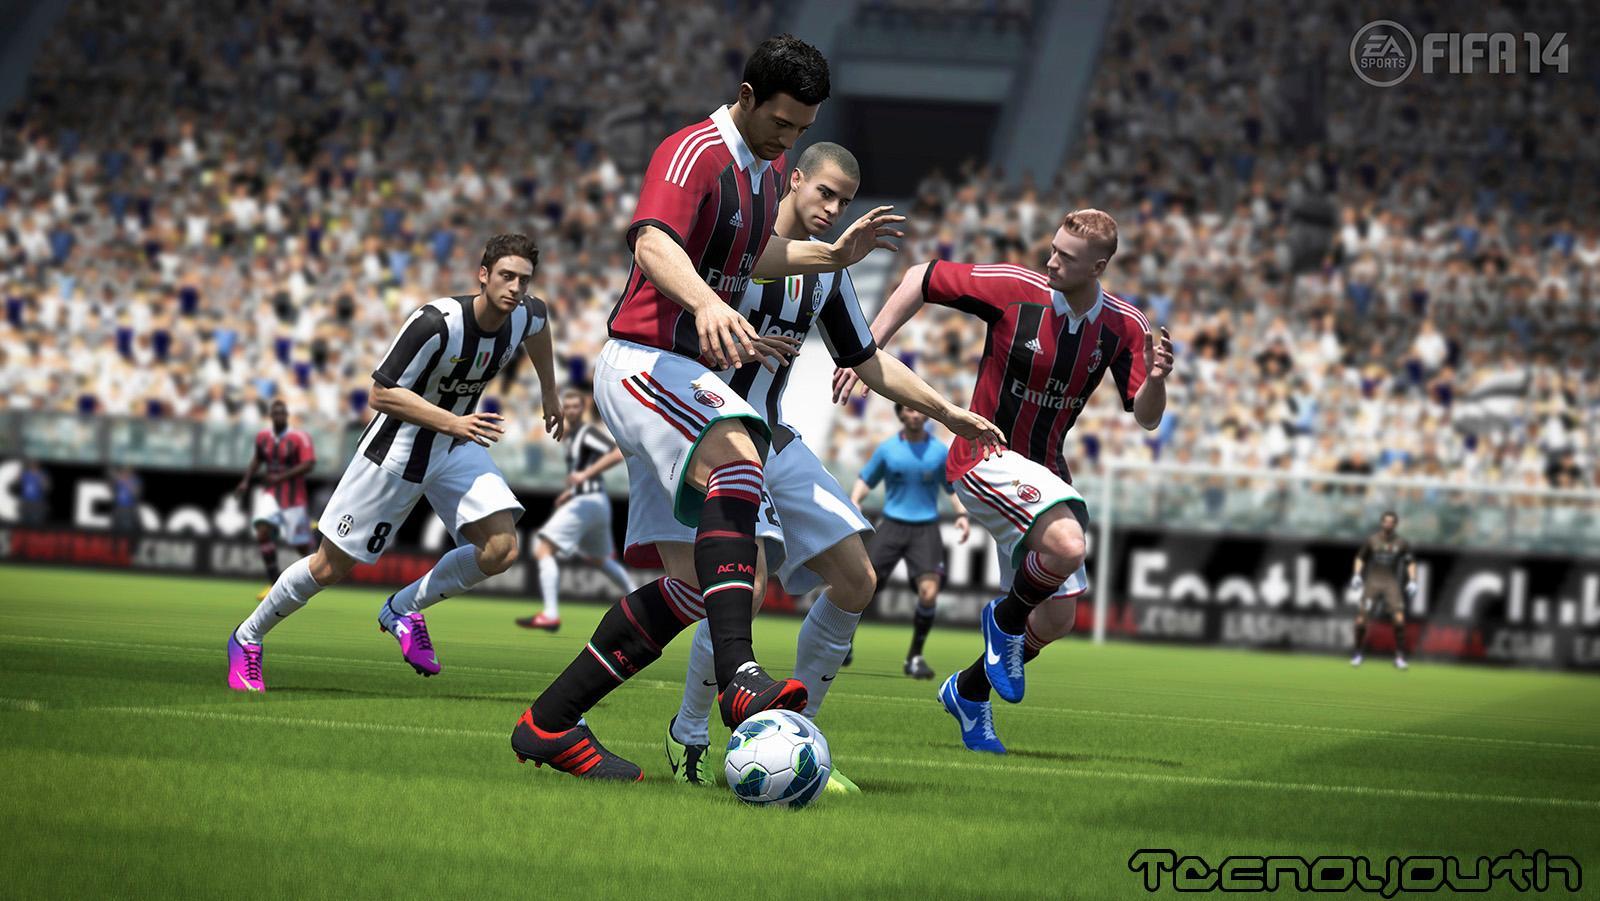 FIFA 14 Gameplay 2